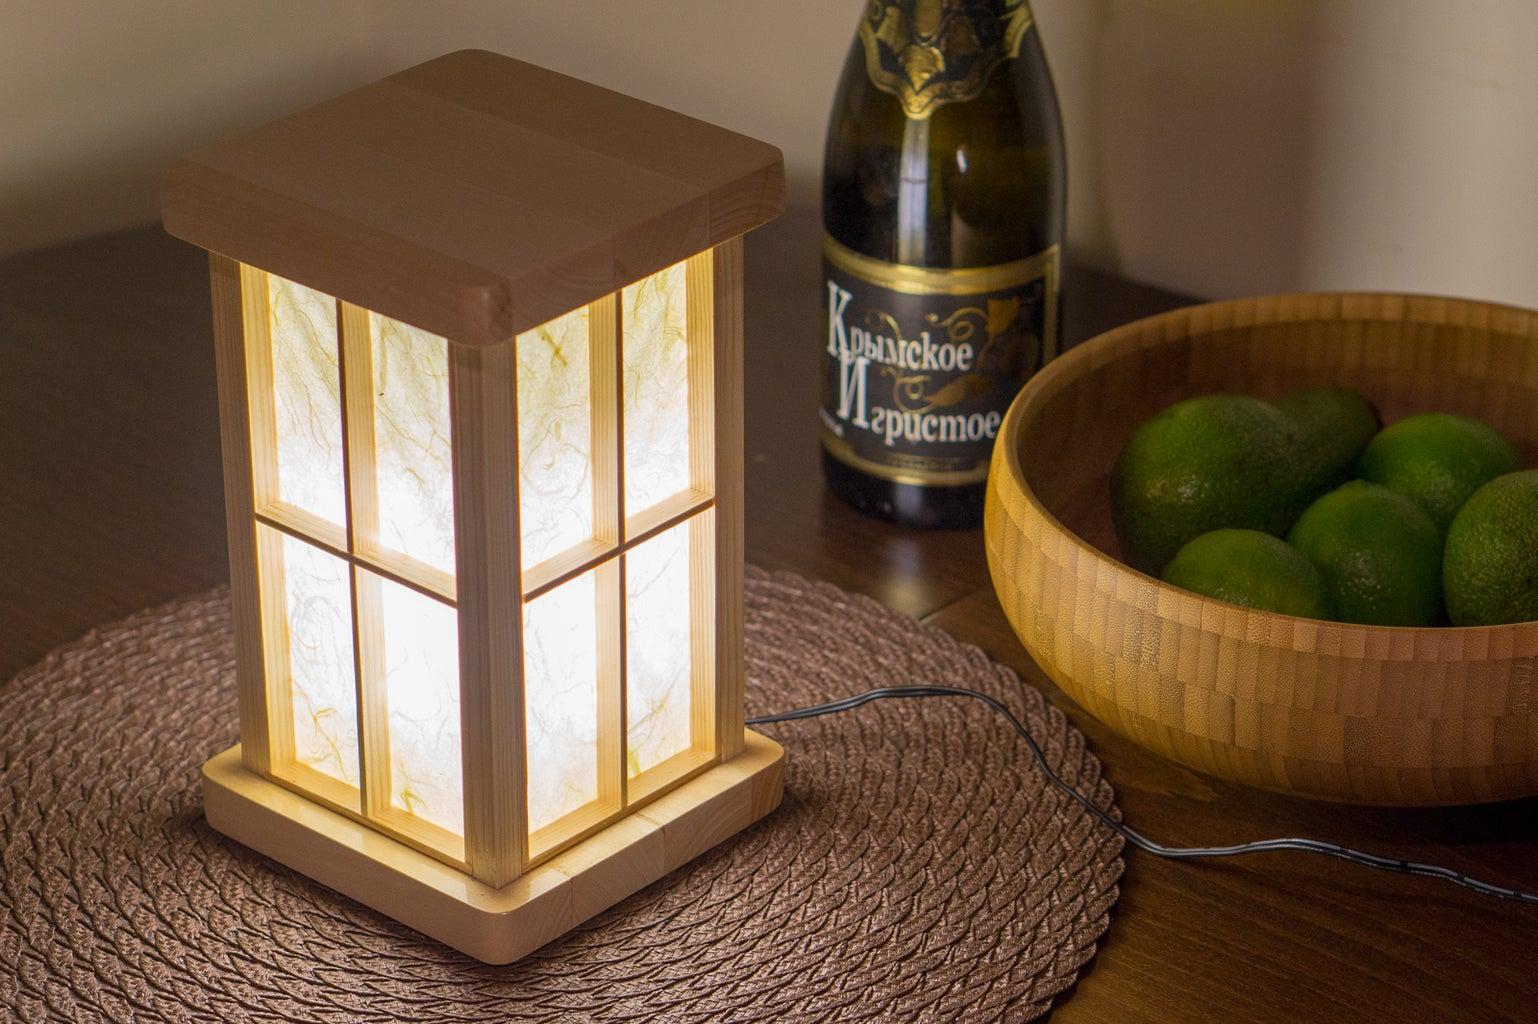 Touch-sensitive LED Lantern